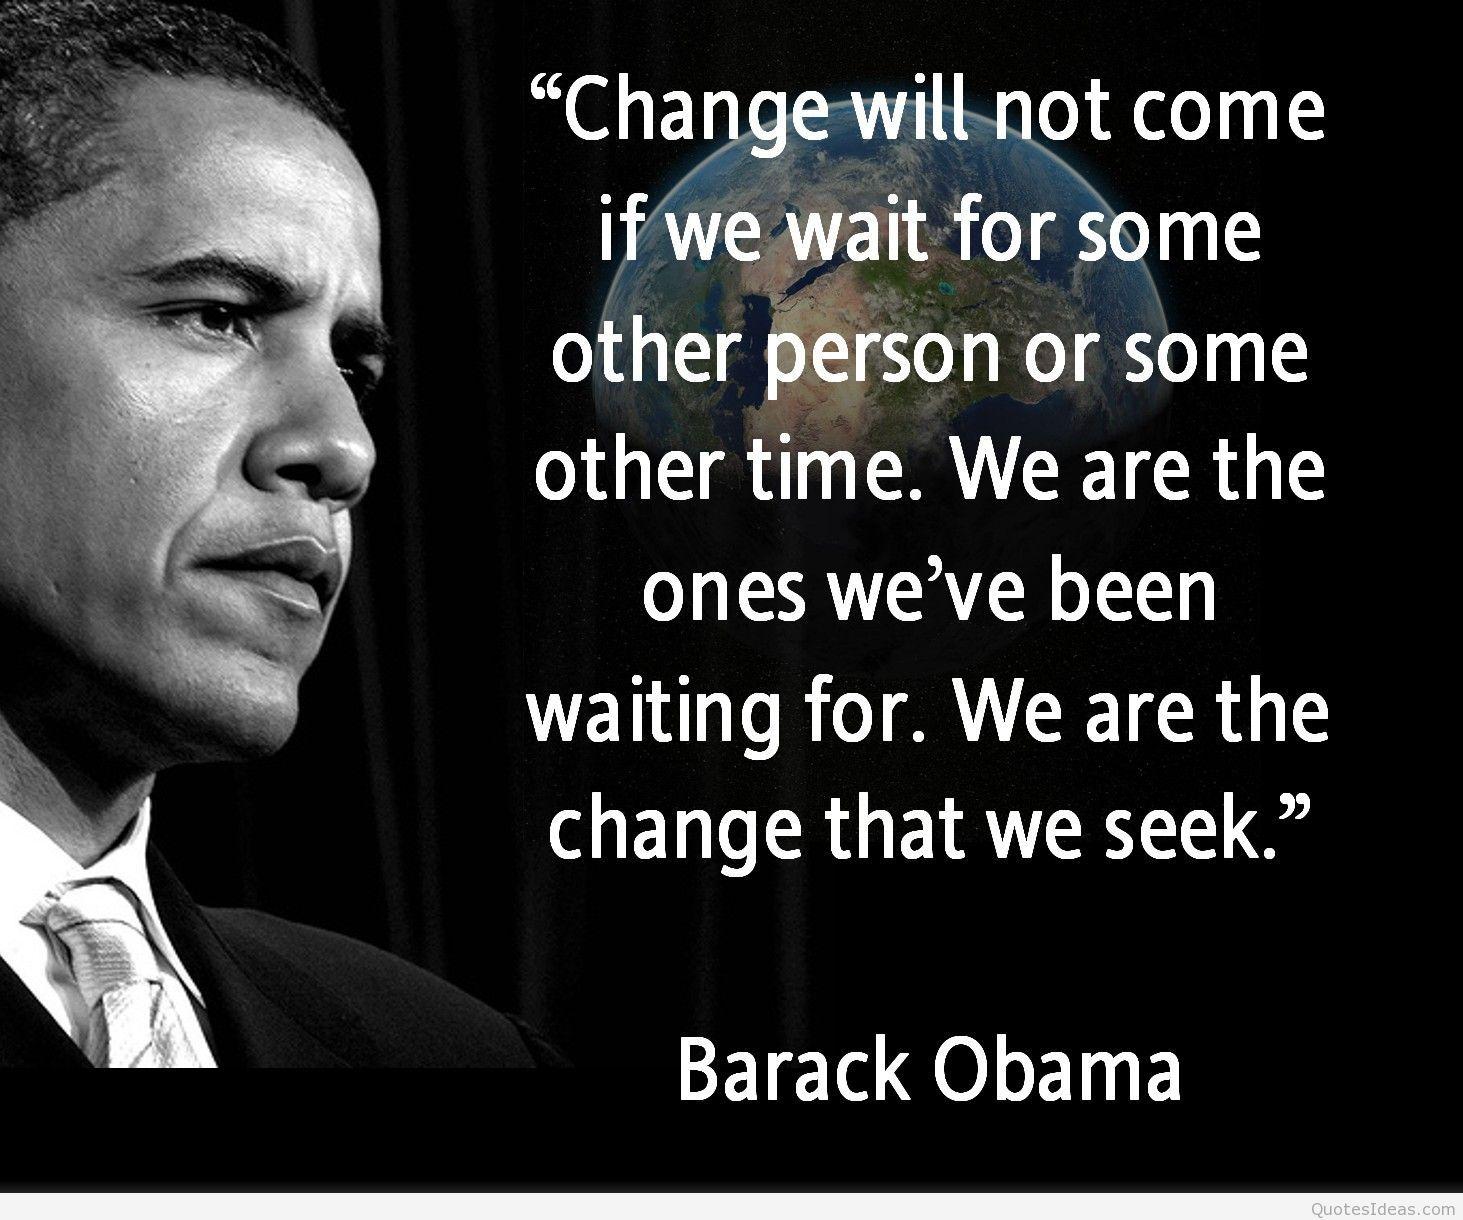 Obama Quotes President Obama  Motivational Qoutes  Pinterest  Quotes Images